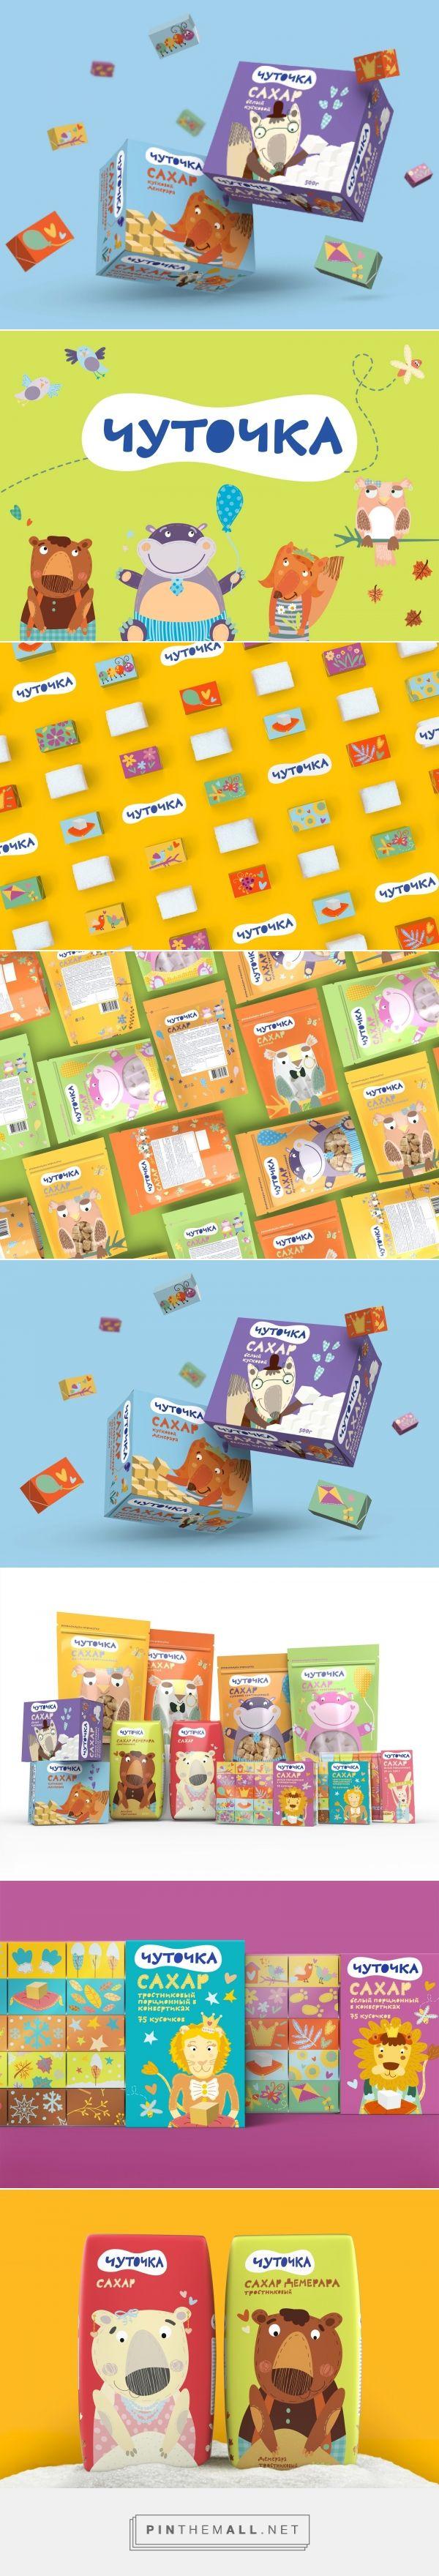 Nevsky Sugar Petersburg - Packaging of the World - Creative Package Design Gallery - http://www.packagingoftheworld.com/2017/11/nevsky-sugar-petersburg.html